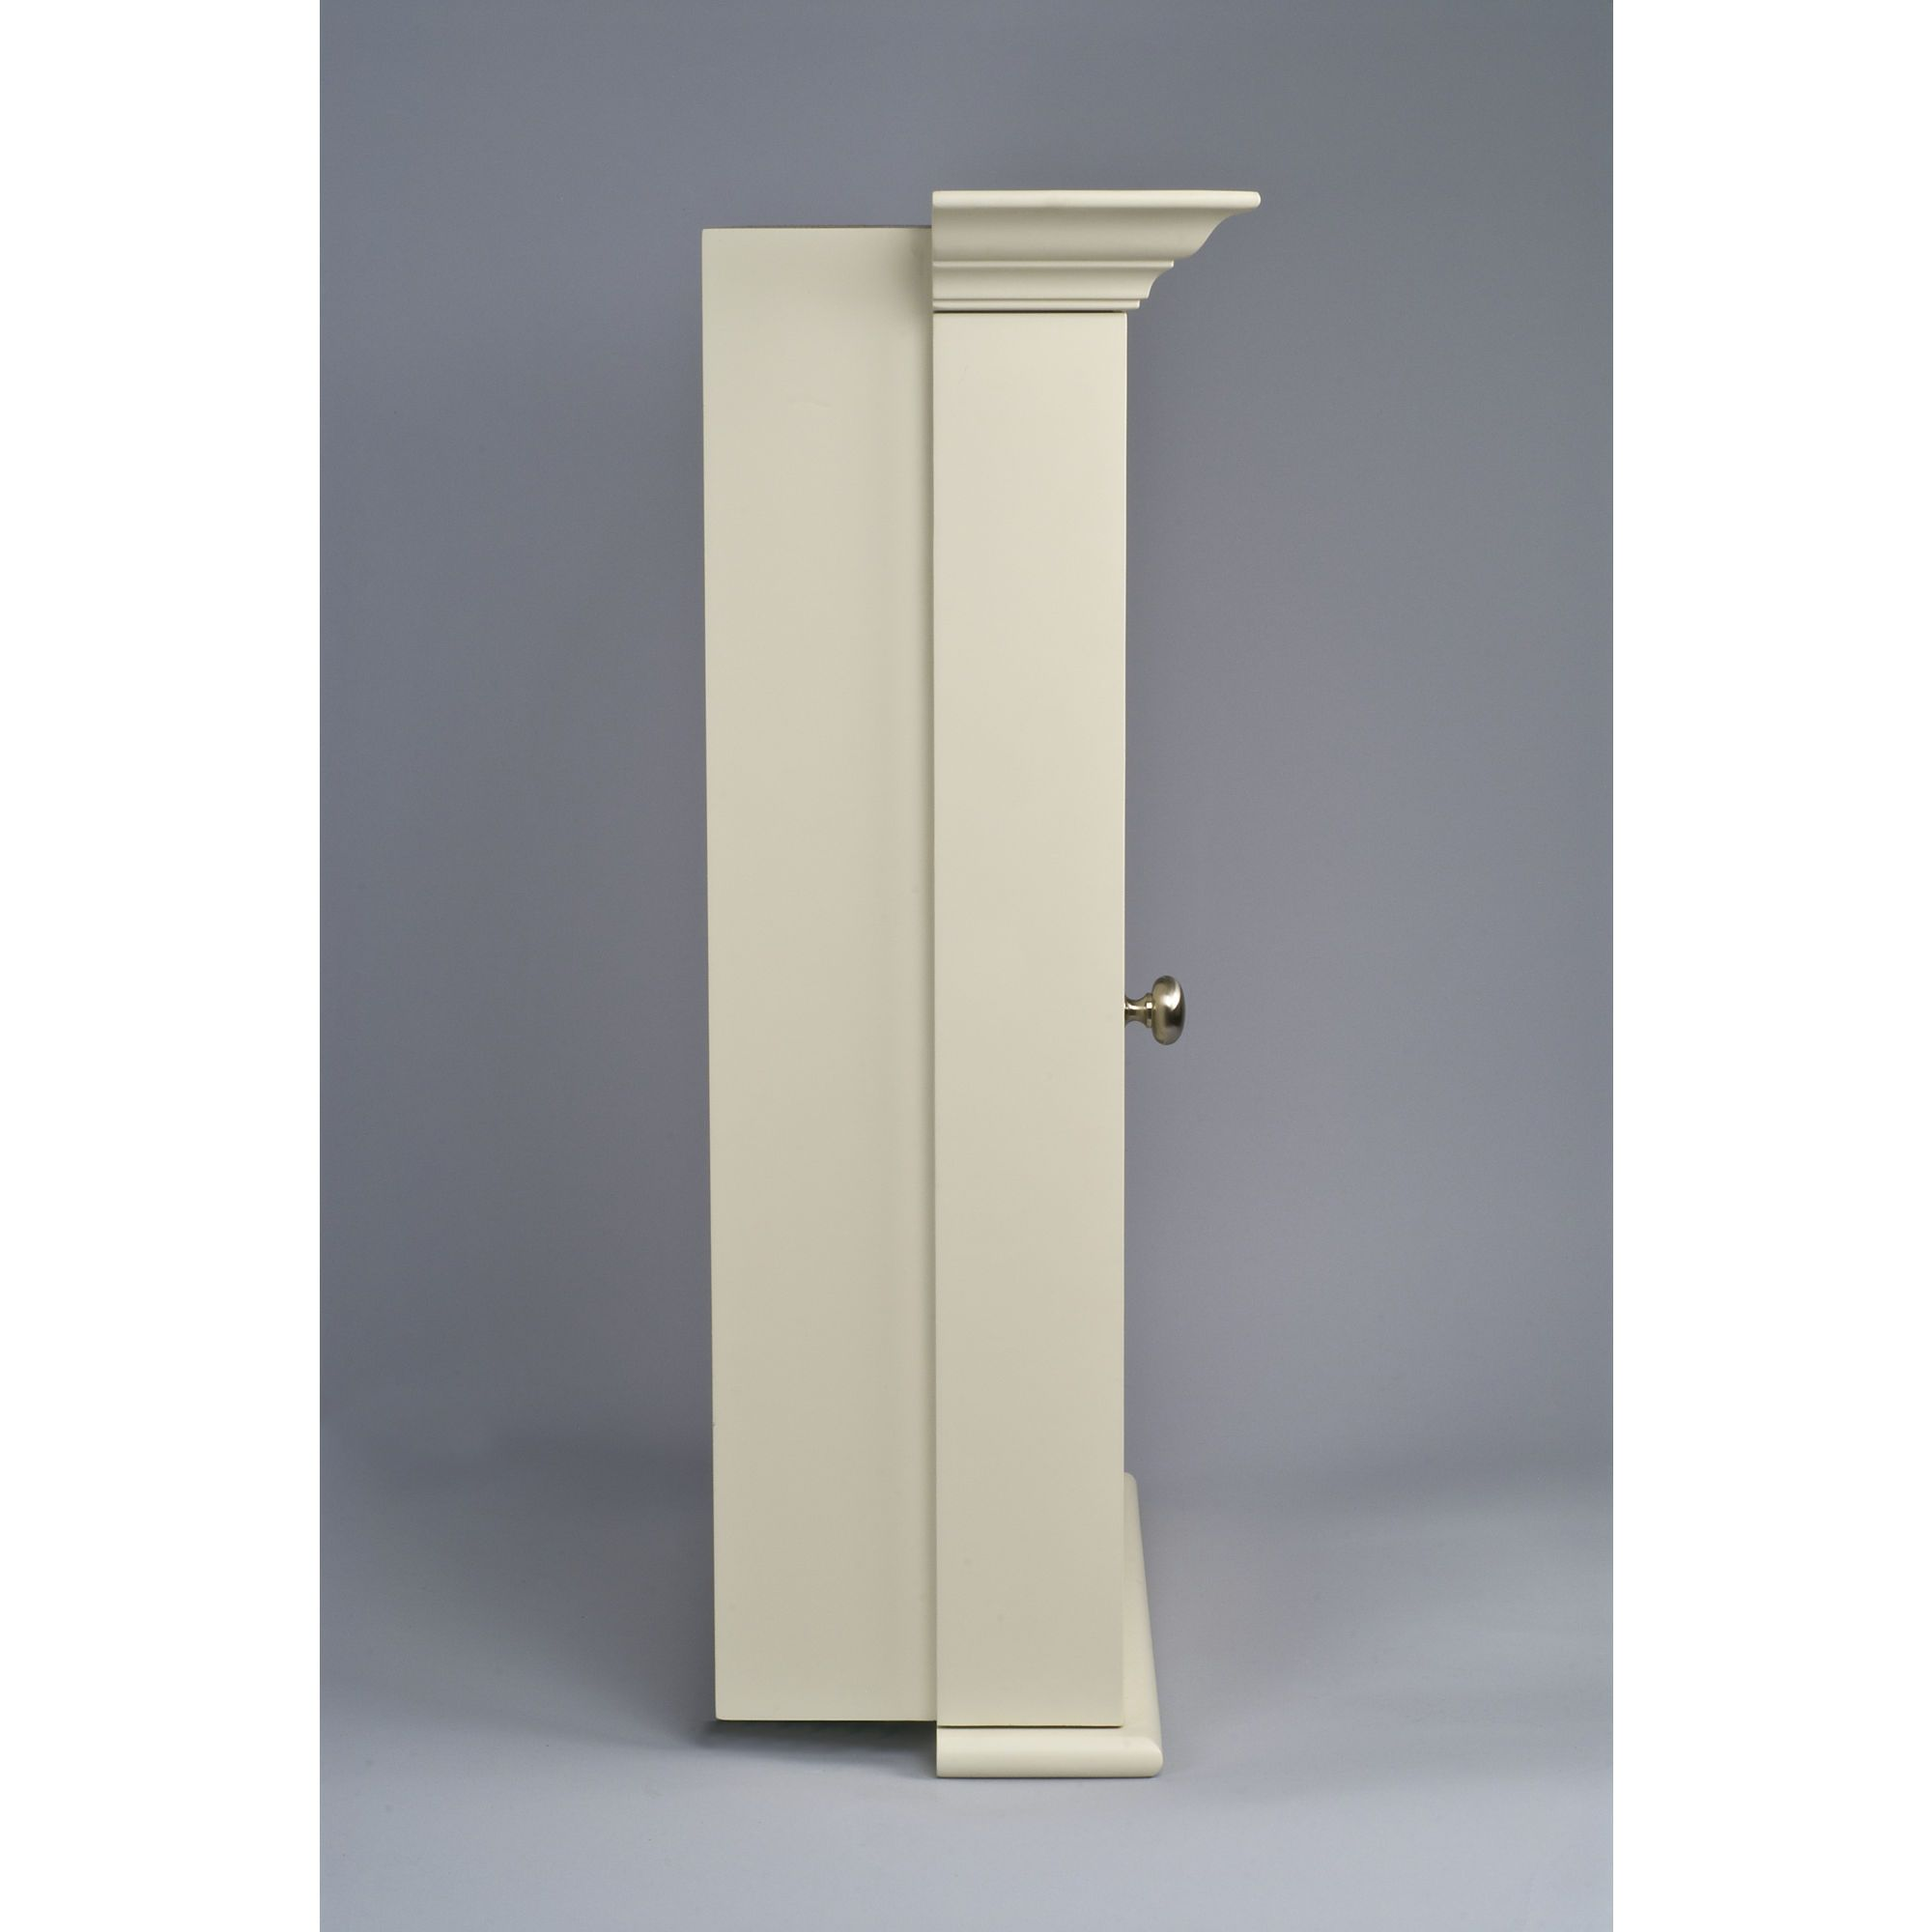 Stupendous Ilfracombe 25 75 X 30 13 Recessed Medicine Cabinet 589 Interior Design Ideas Philsoteloinfo